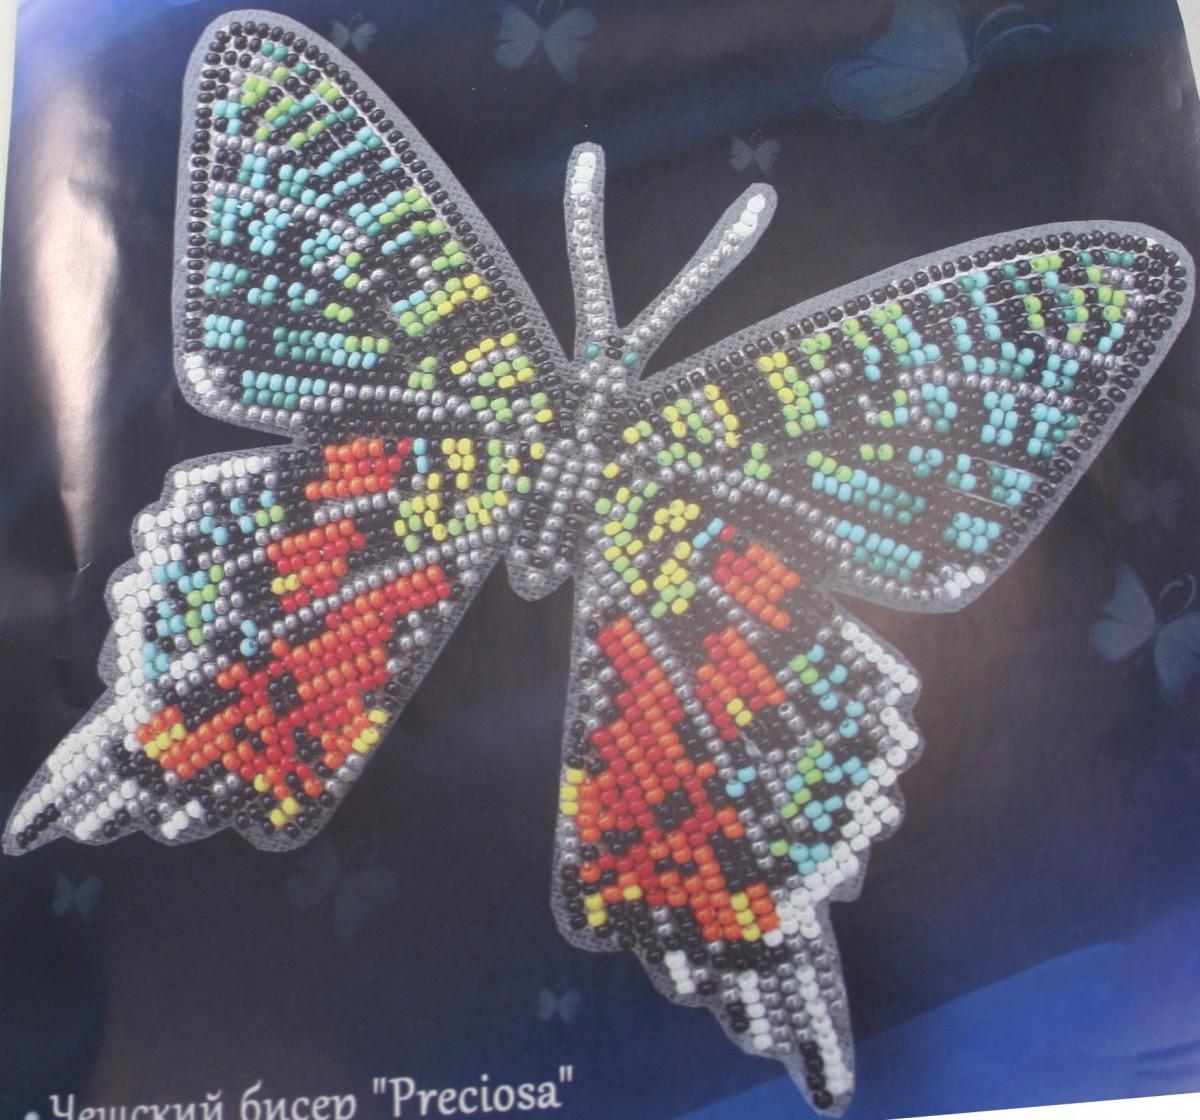 Ghrysiridia Madagascarensis